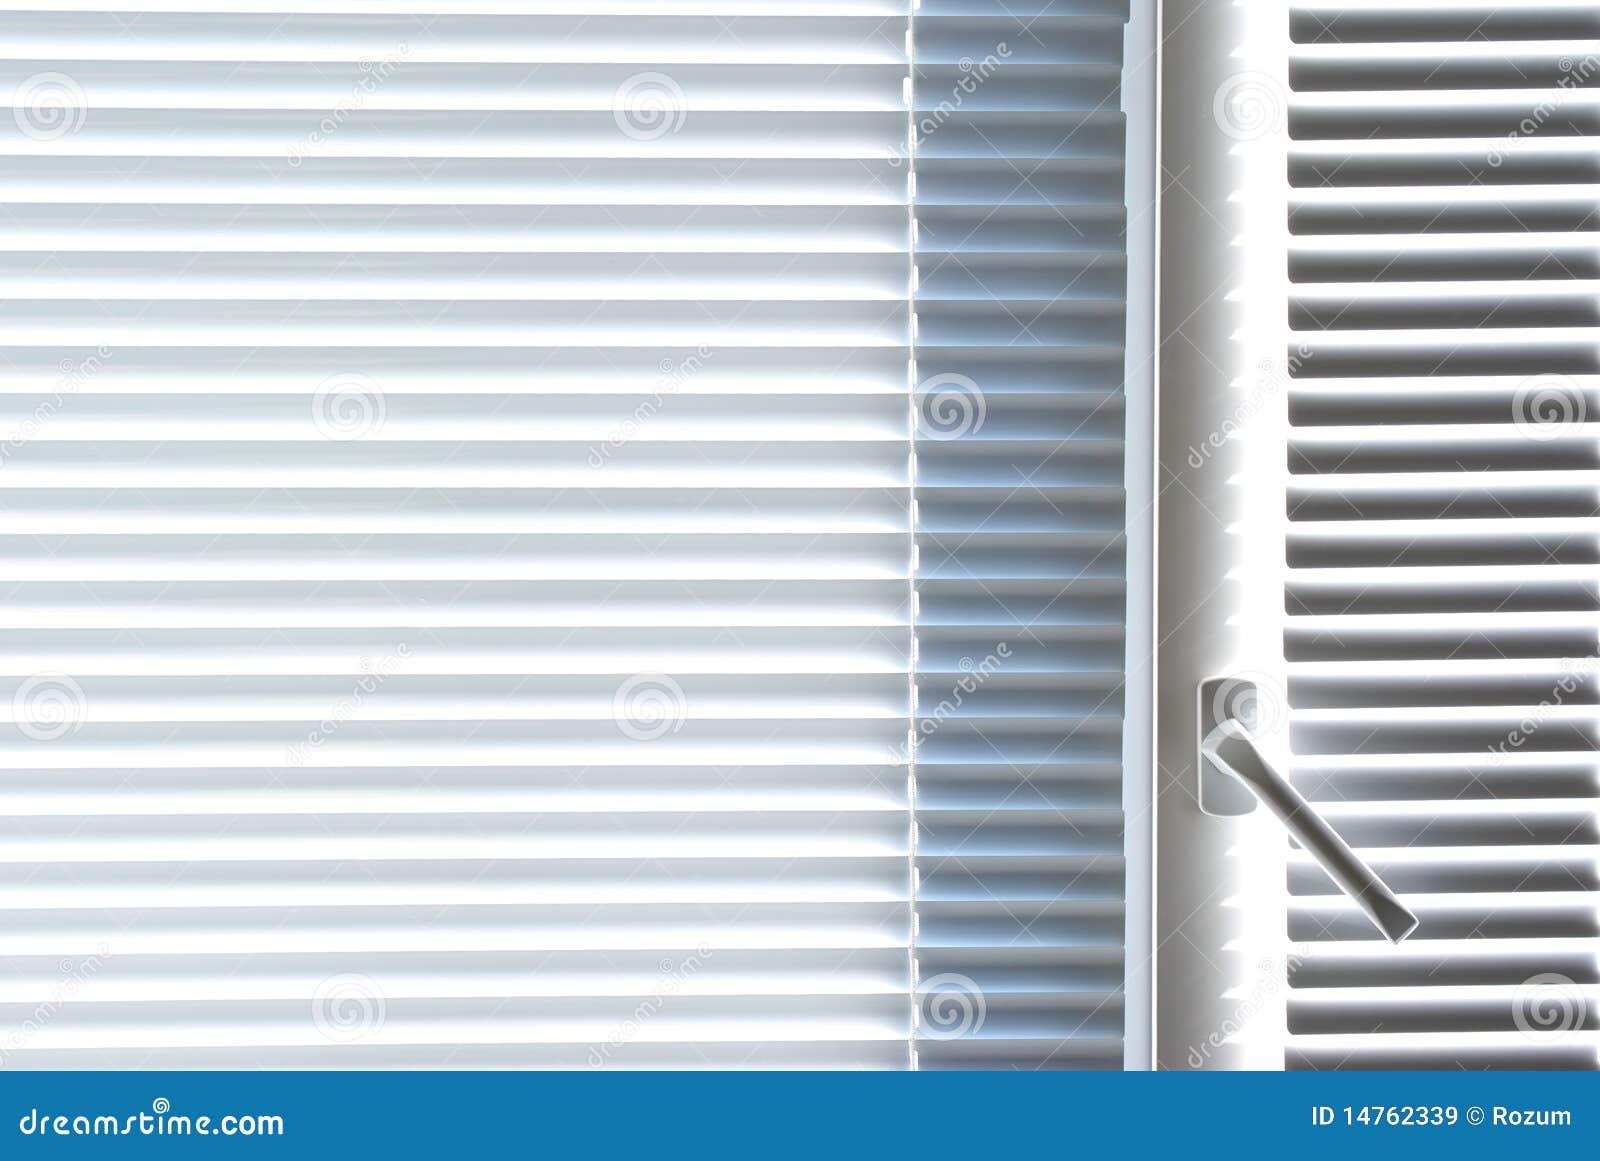 Window with white jalousie royalty free stock images for Jalousie window design